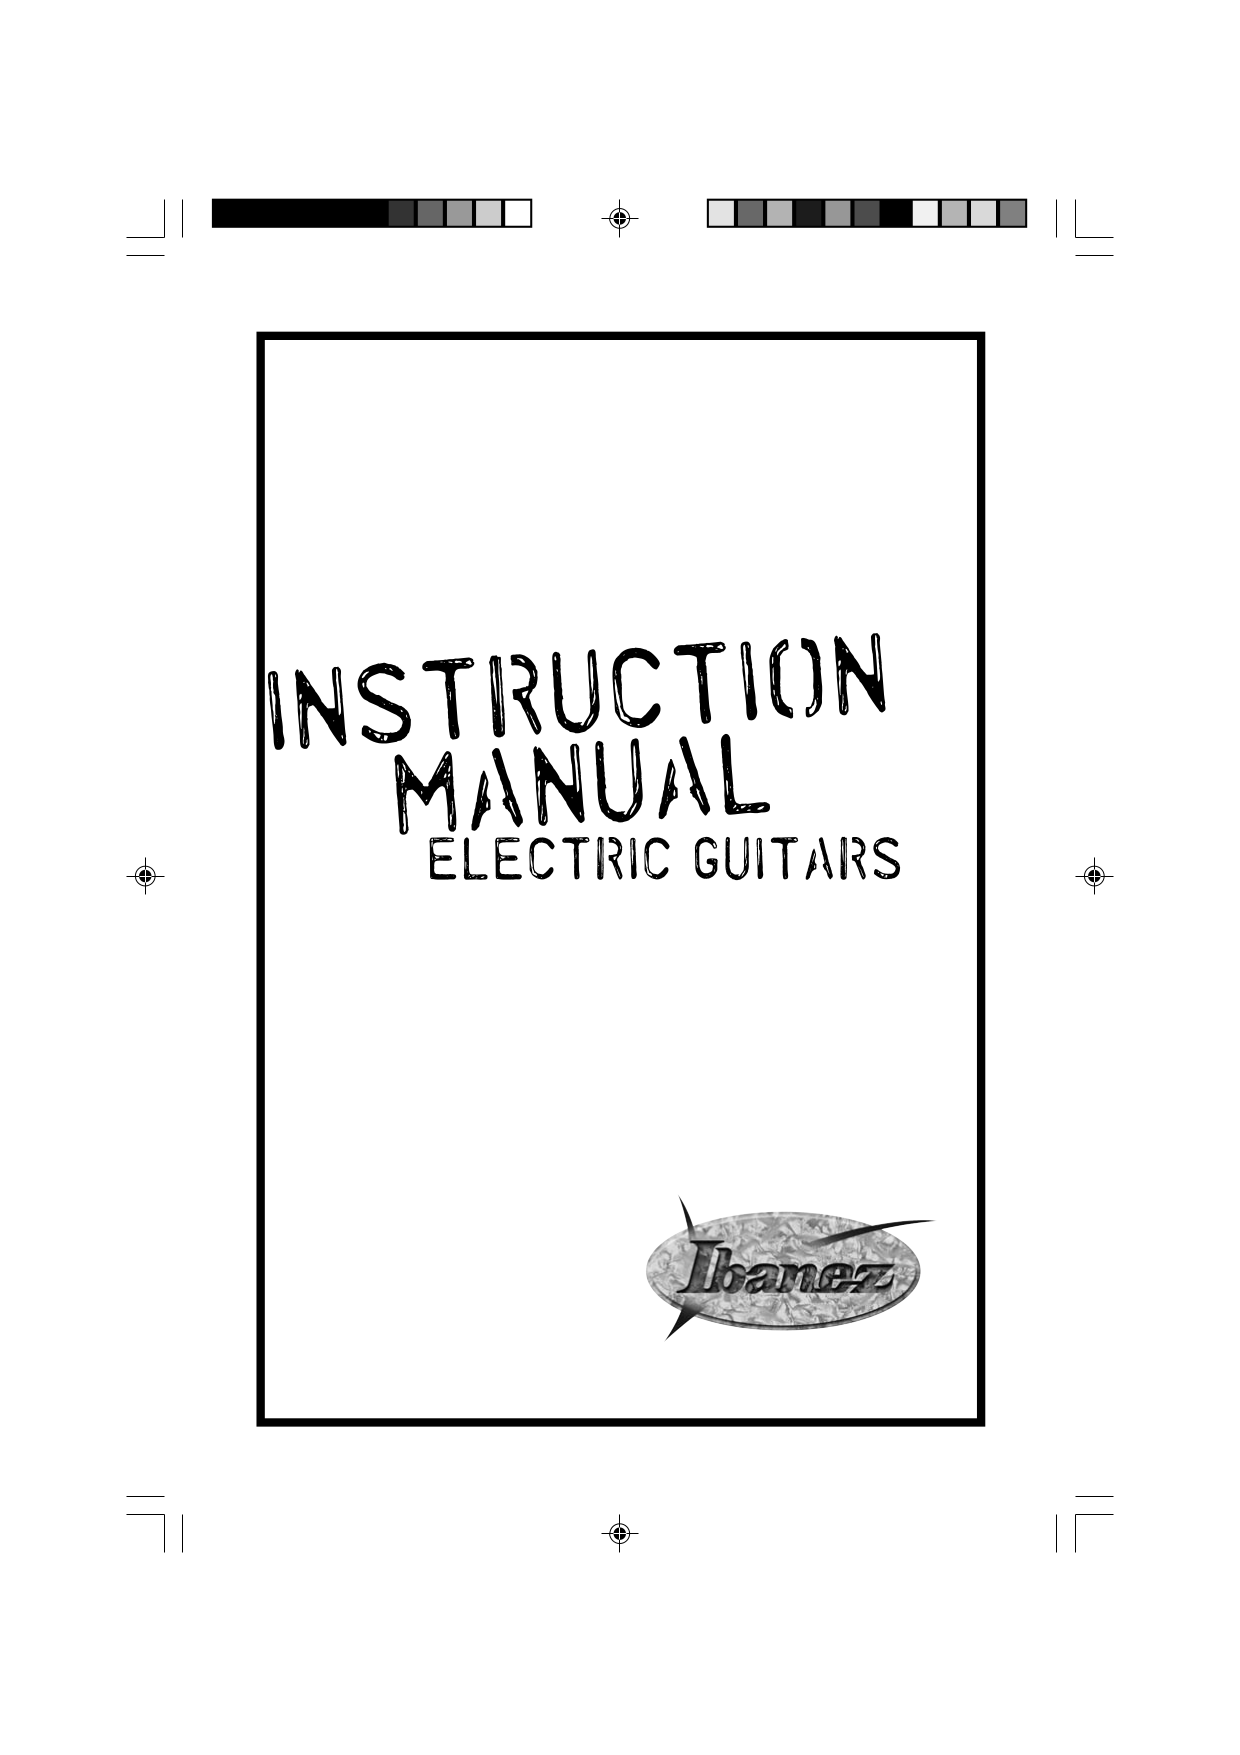 Download free pdf for Ibanez GAX70 Guitar manual